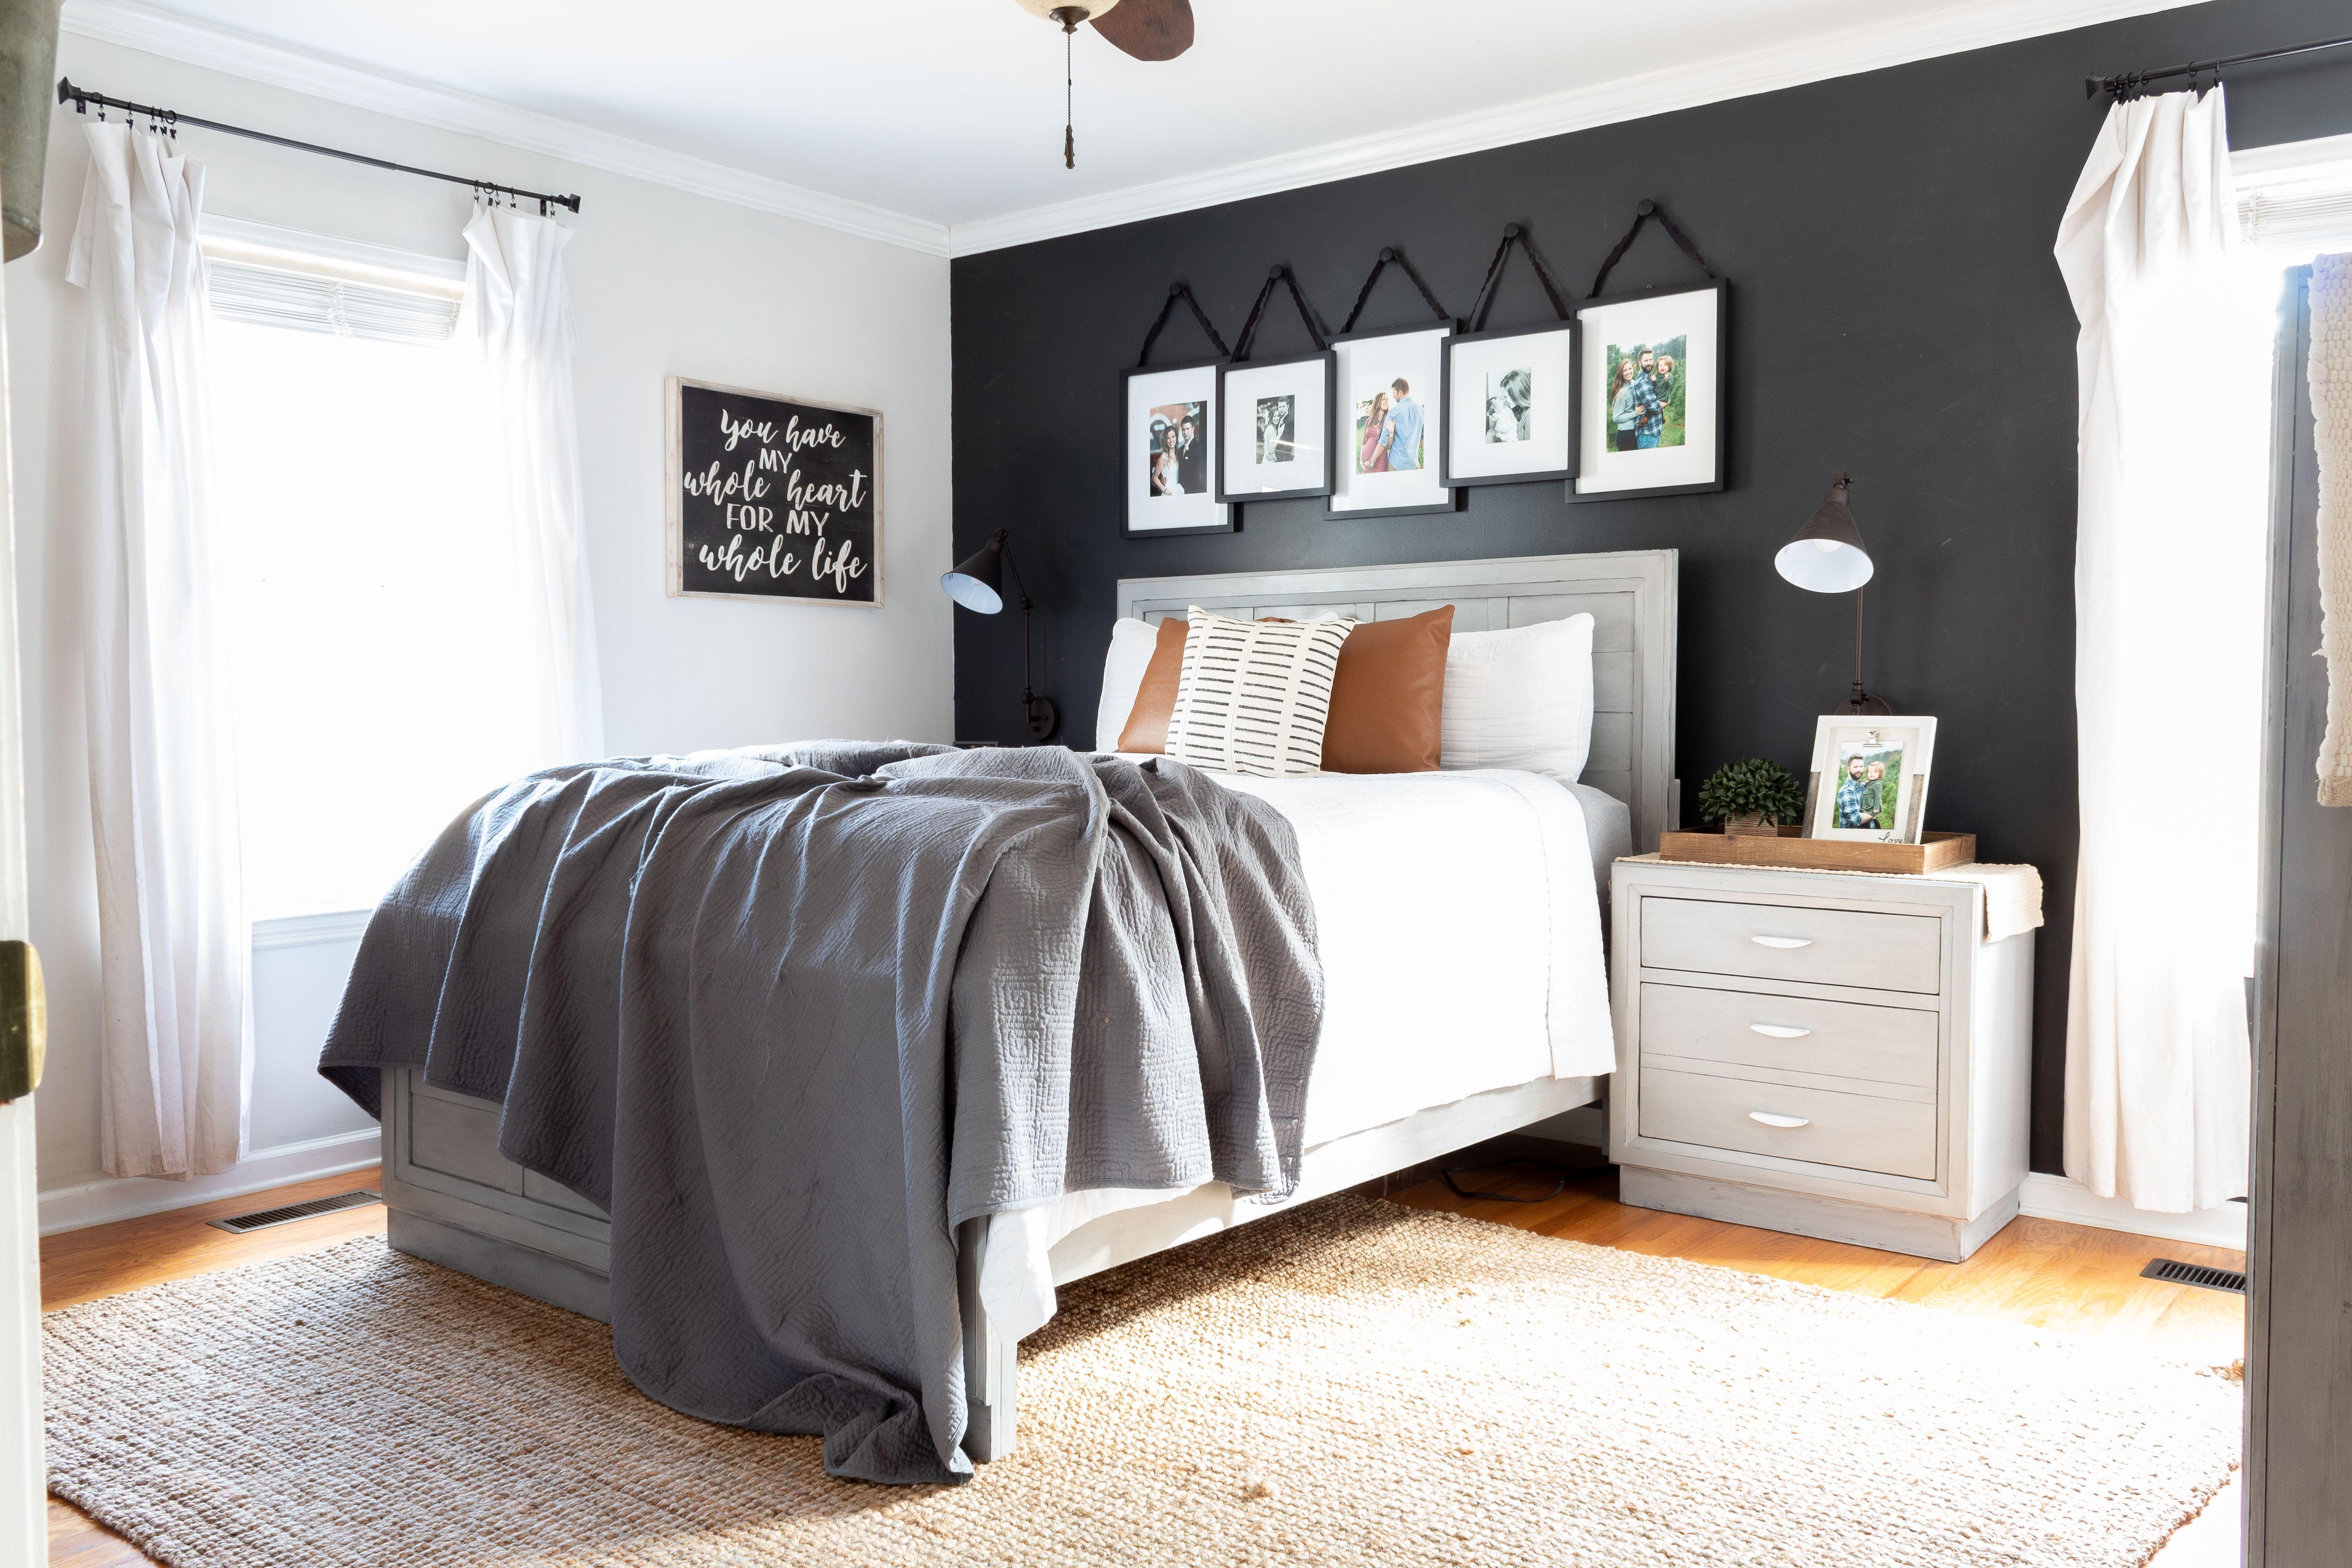 Master Bedroom Black Accent Wall Cityloftsherwinwilliams Black Accent Wall Iron Accent Bedro In 2020 Black Accent Walls Master Bedroom Accents Accent Wall Bedroom